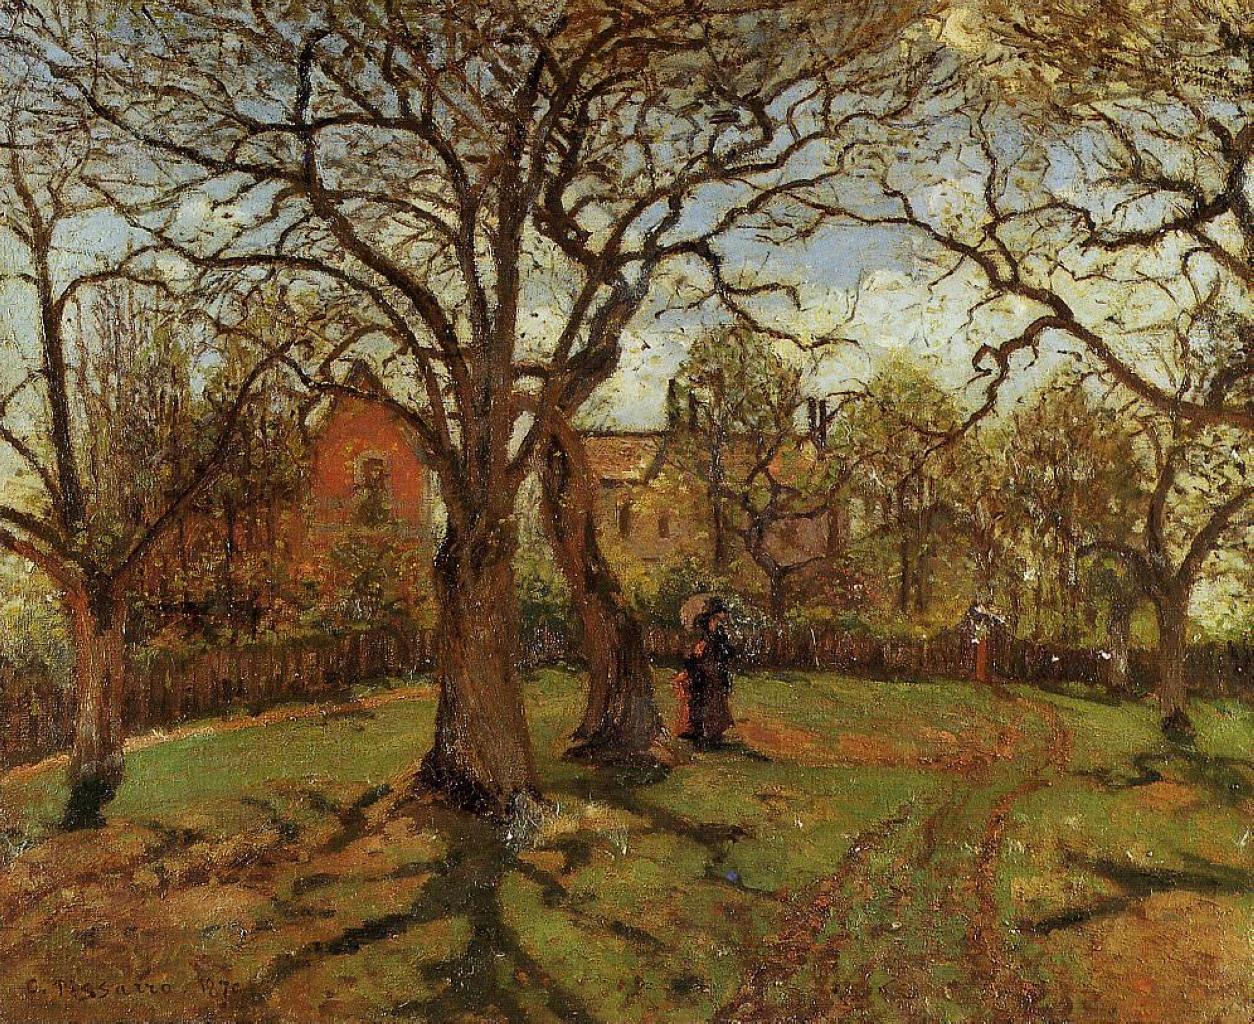 chestnut-trees-louveciennes-spring-1870.jpg